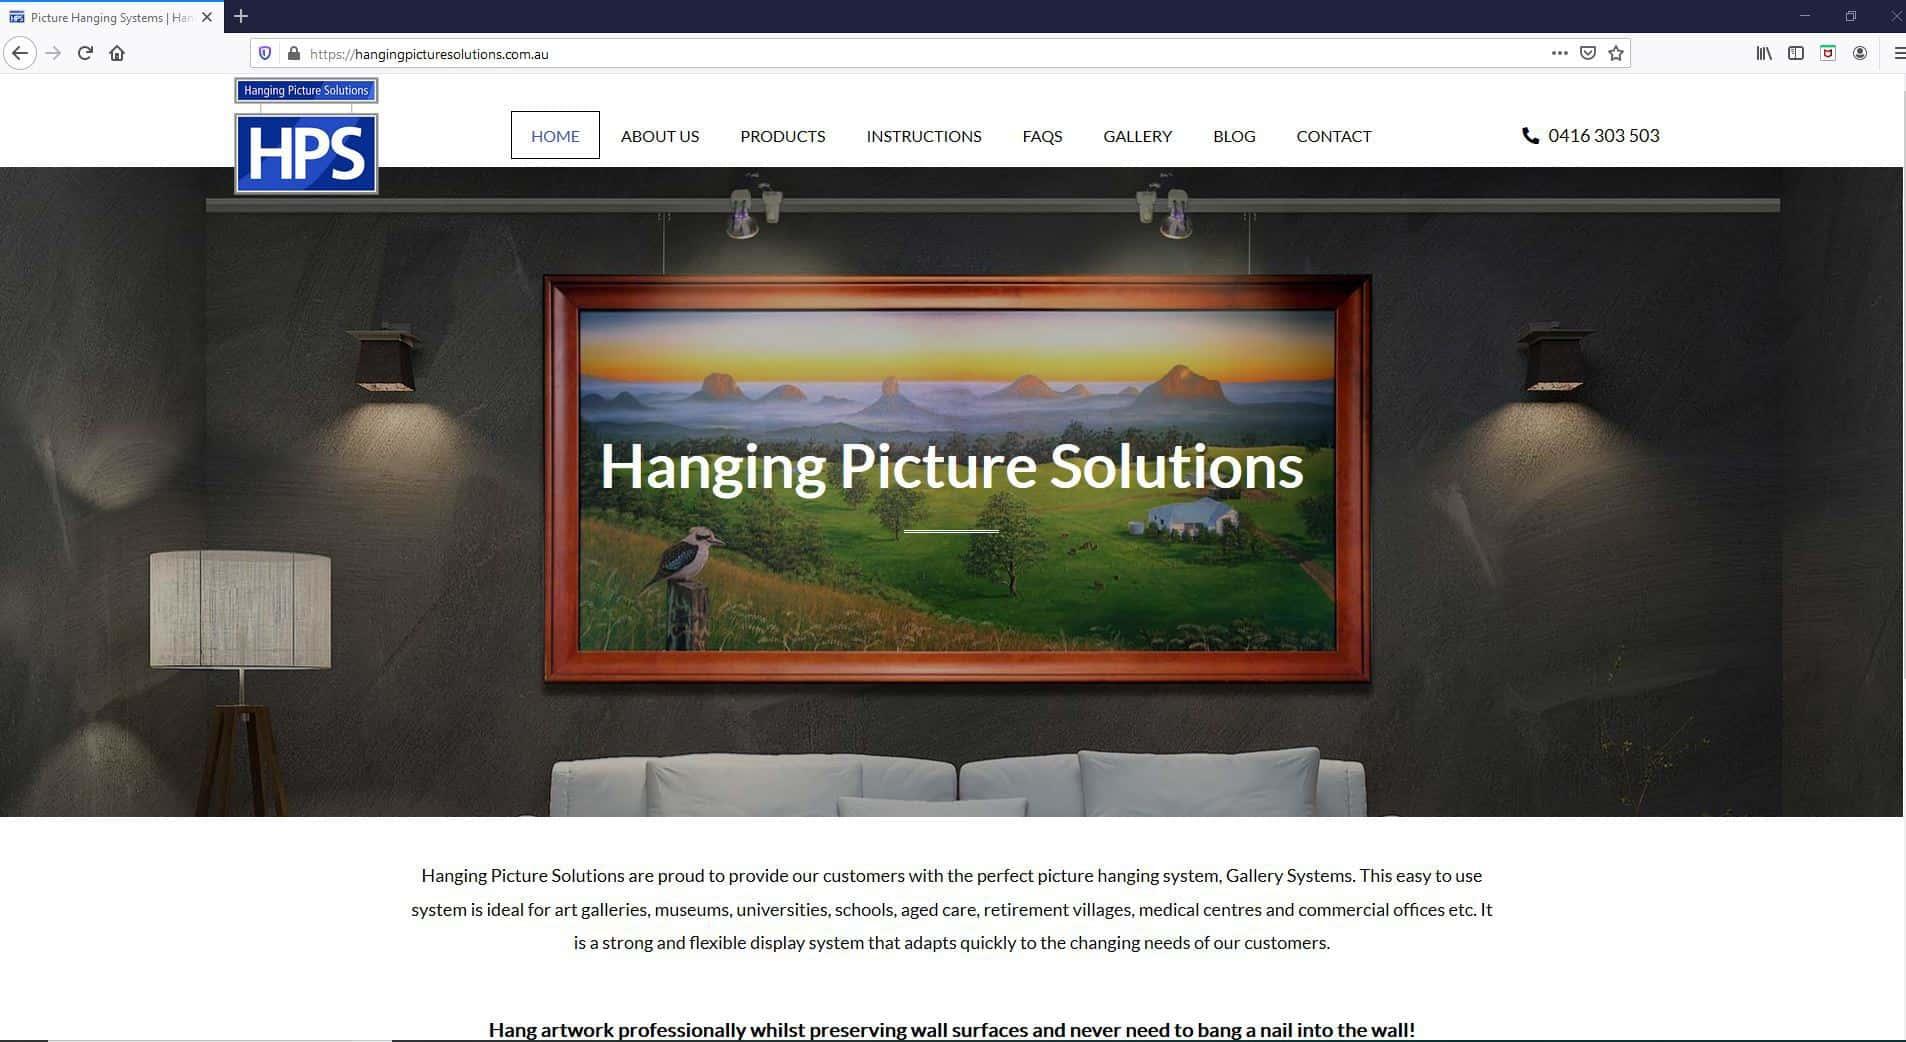 Hanging Picture Solutions Website Screenshot